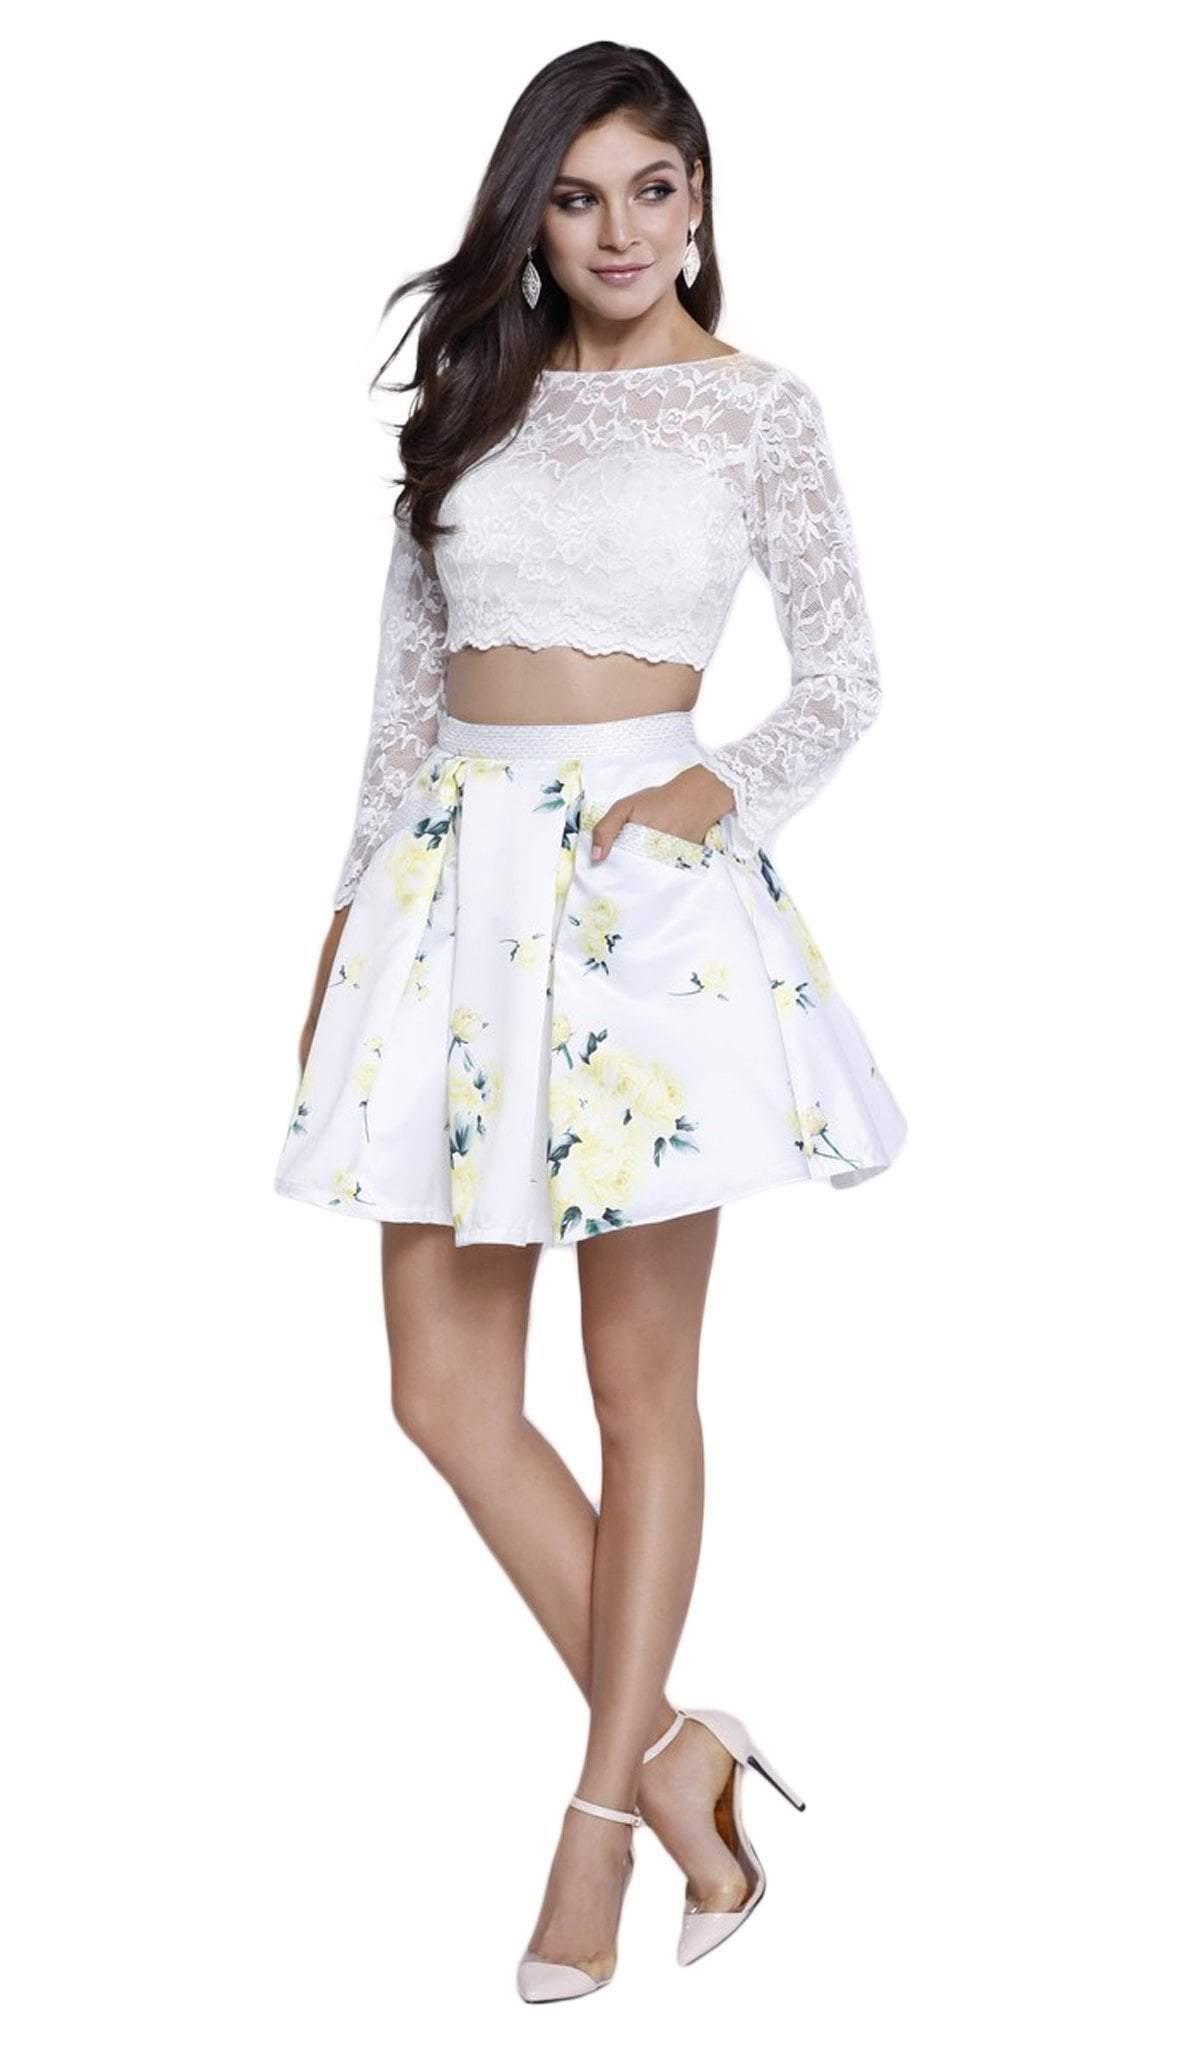 Nox Anabel - 6220 Long Sleeve Illusion Bateau Floral Cocktail Dress